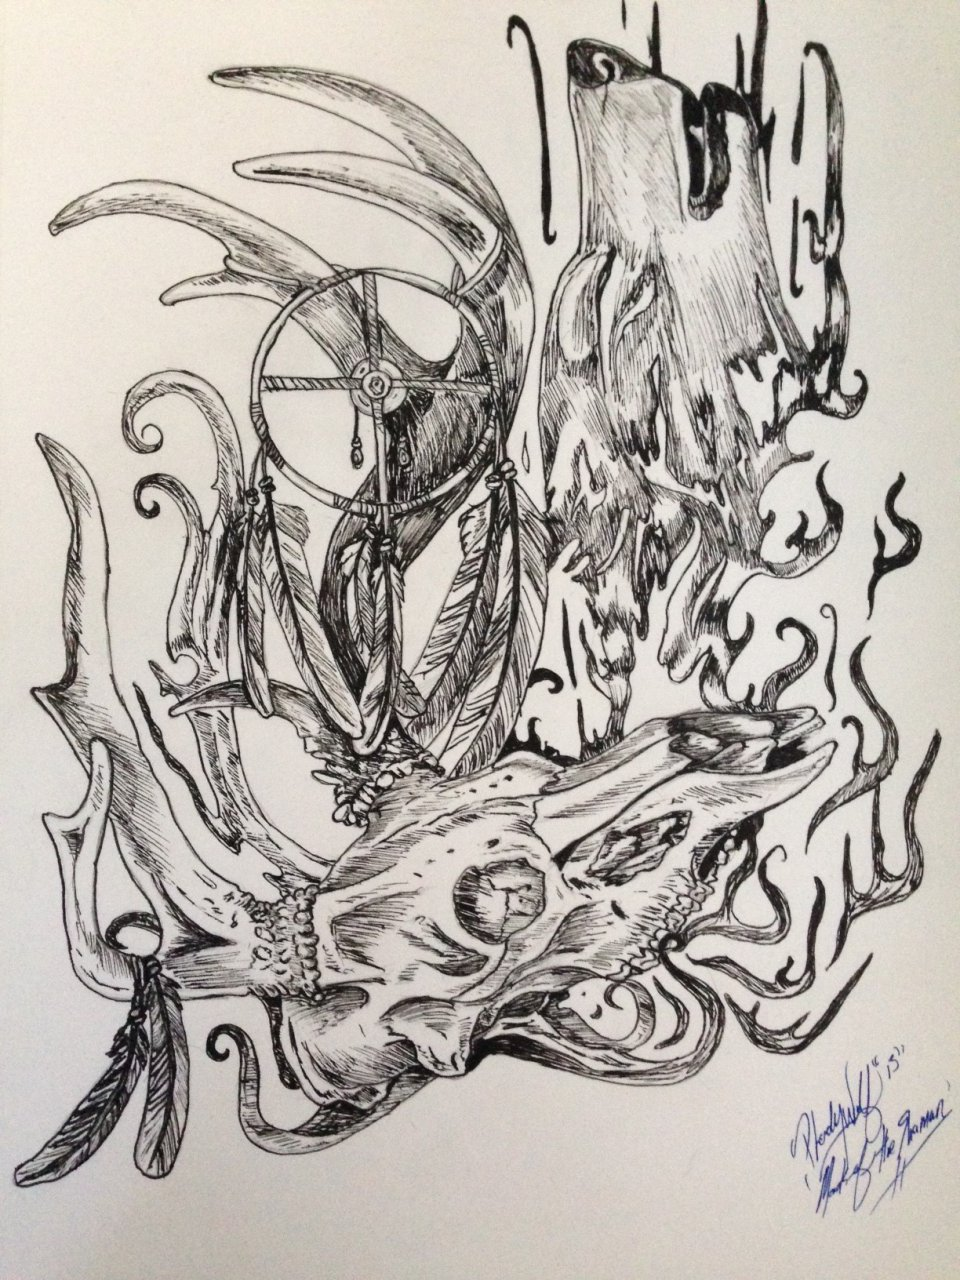 mark of the shaman by pladywolf82